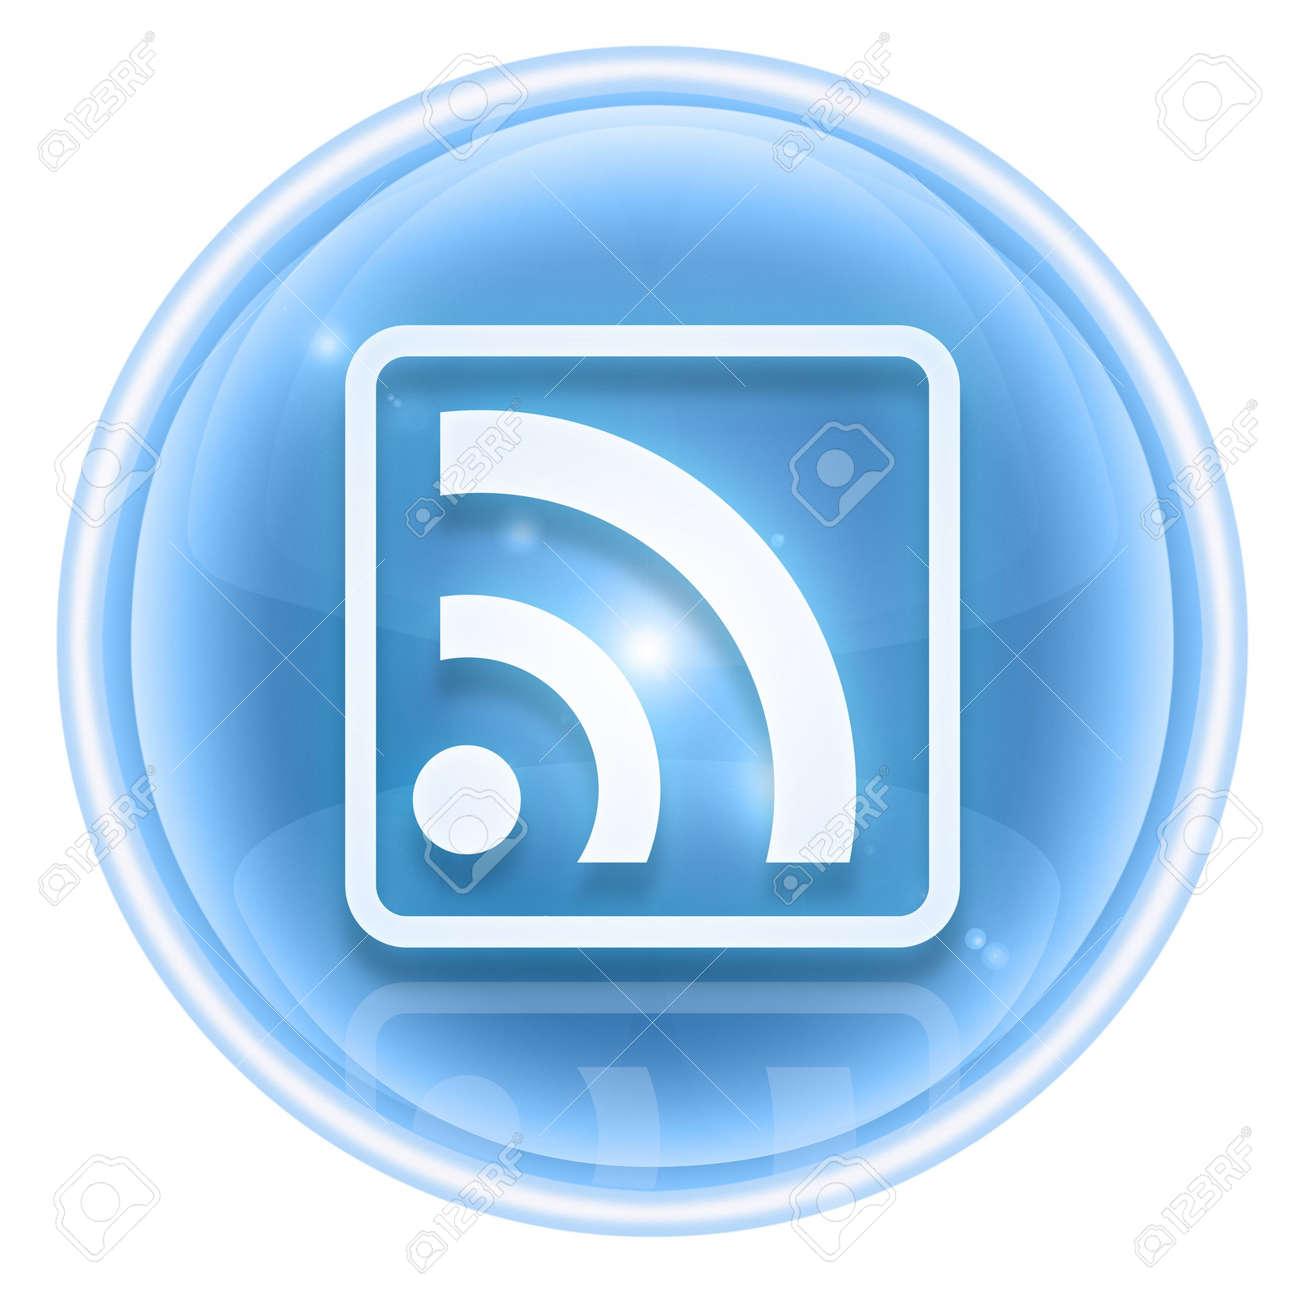 WI-FI icon ice, isolated on white background Stock Photo - 4582719